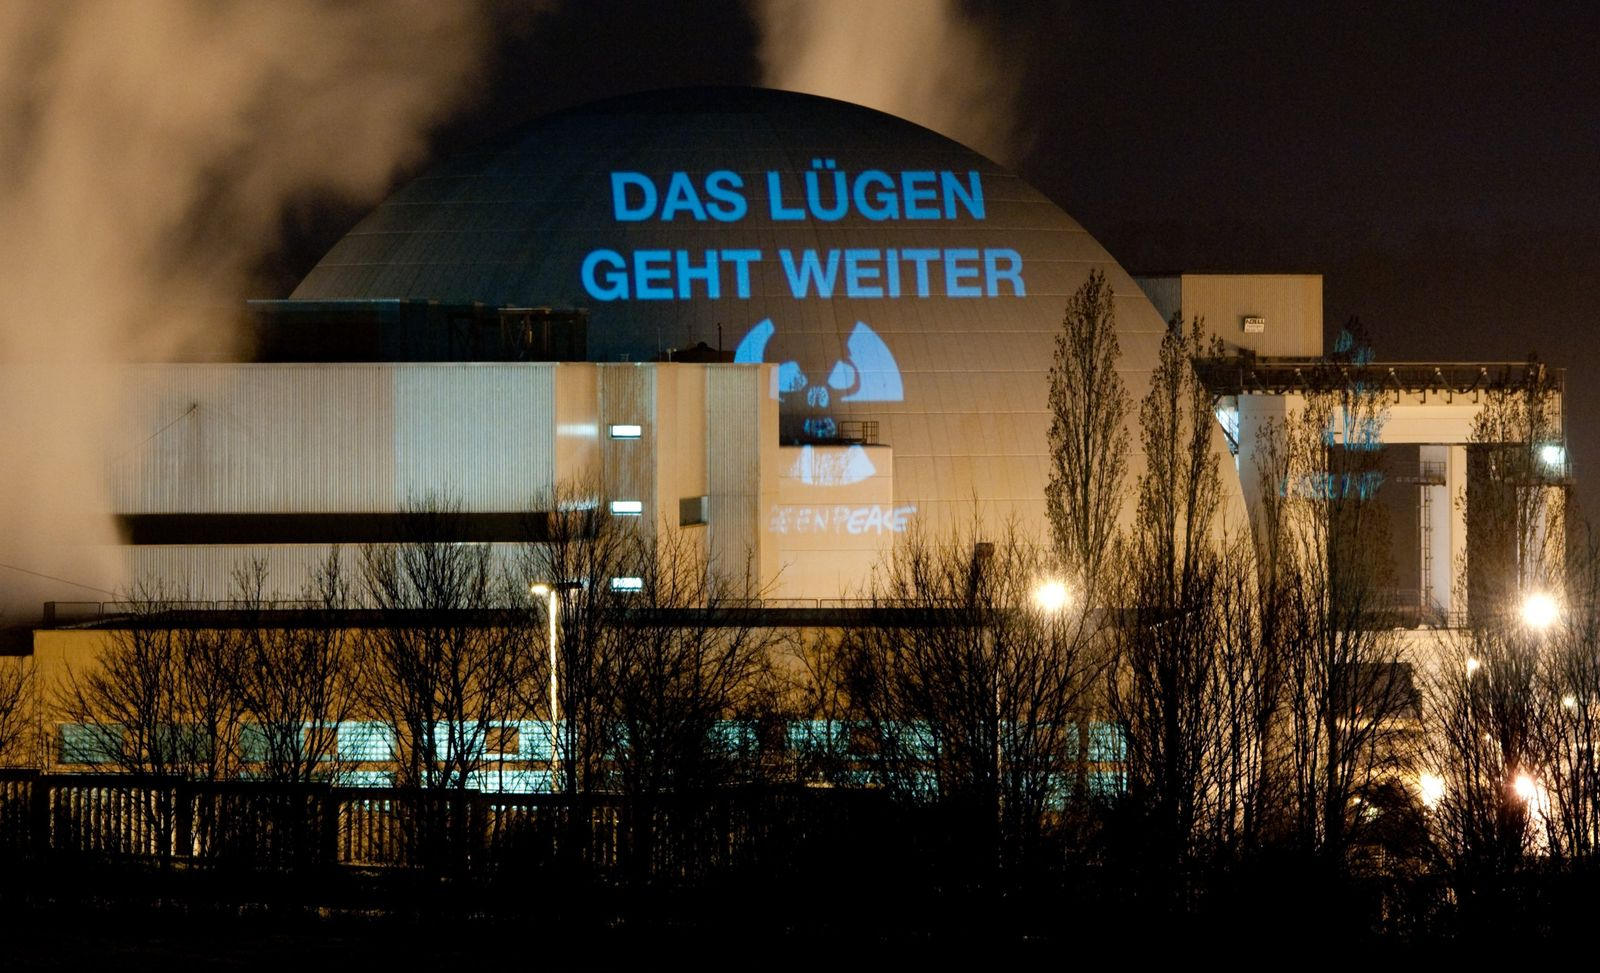 Greenpeace-Protest gegen AKW Neckarwestheim